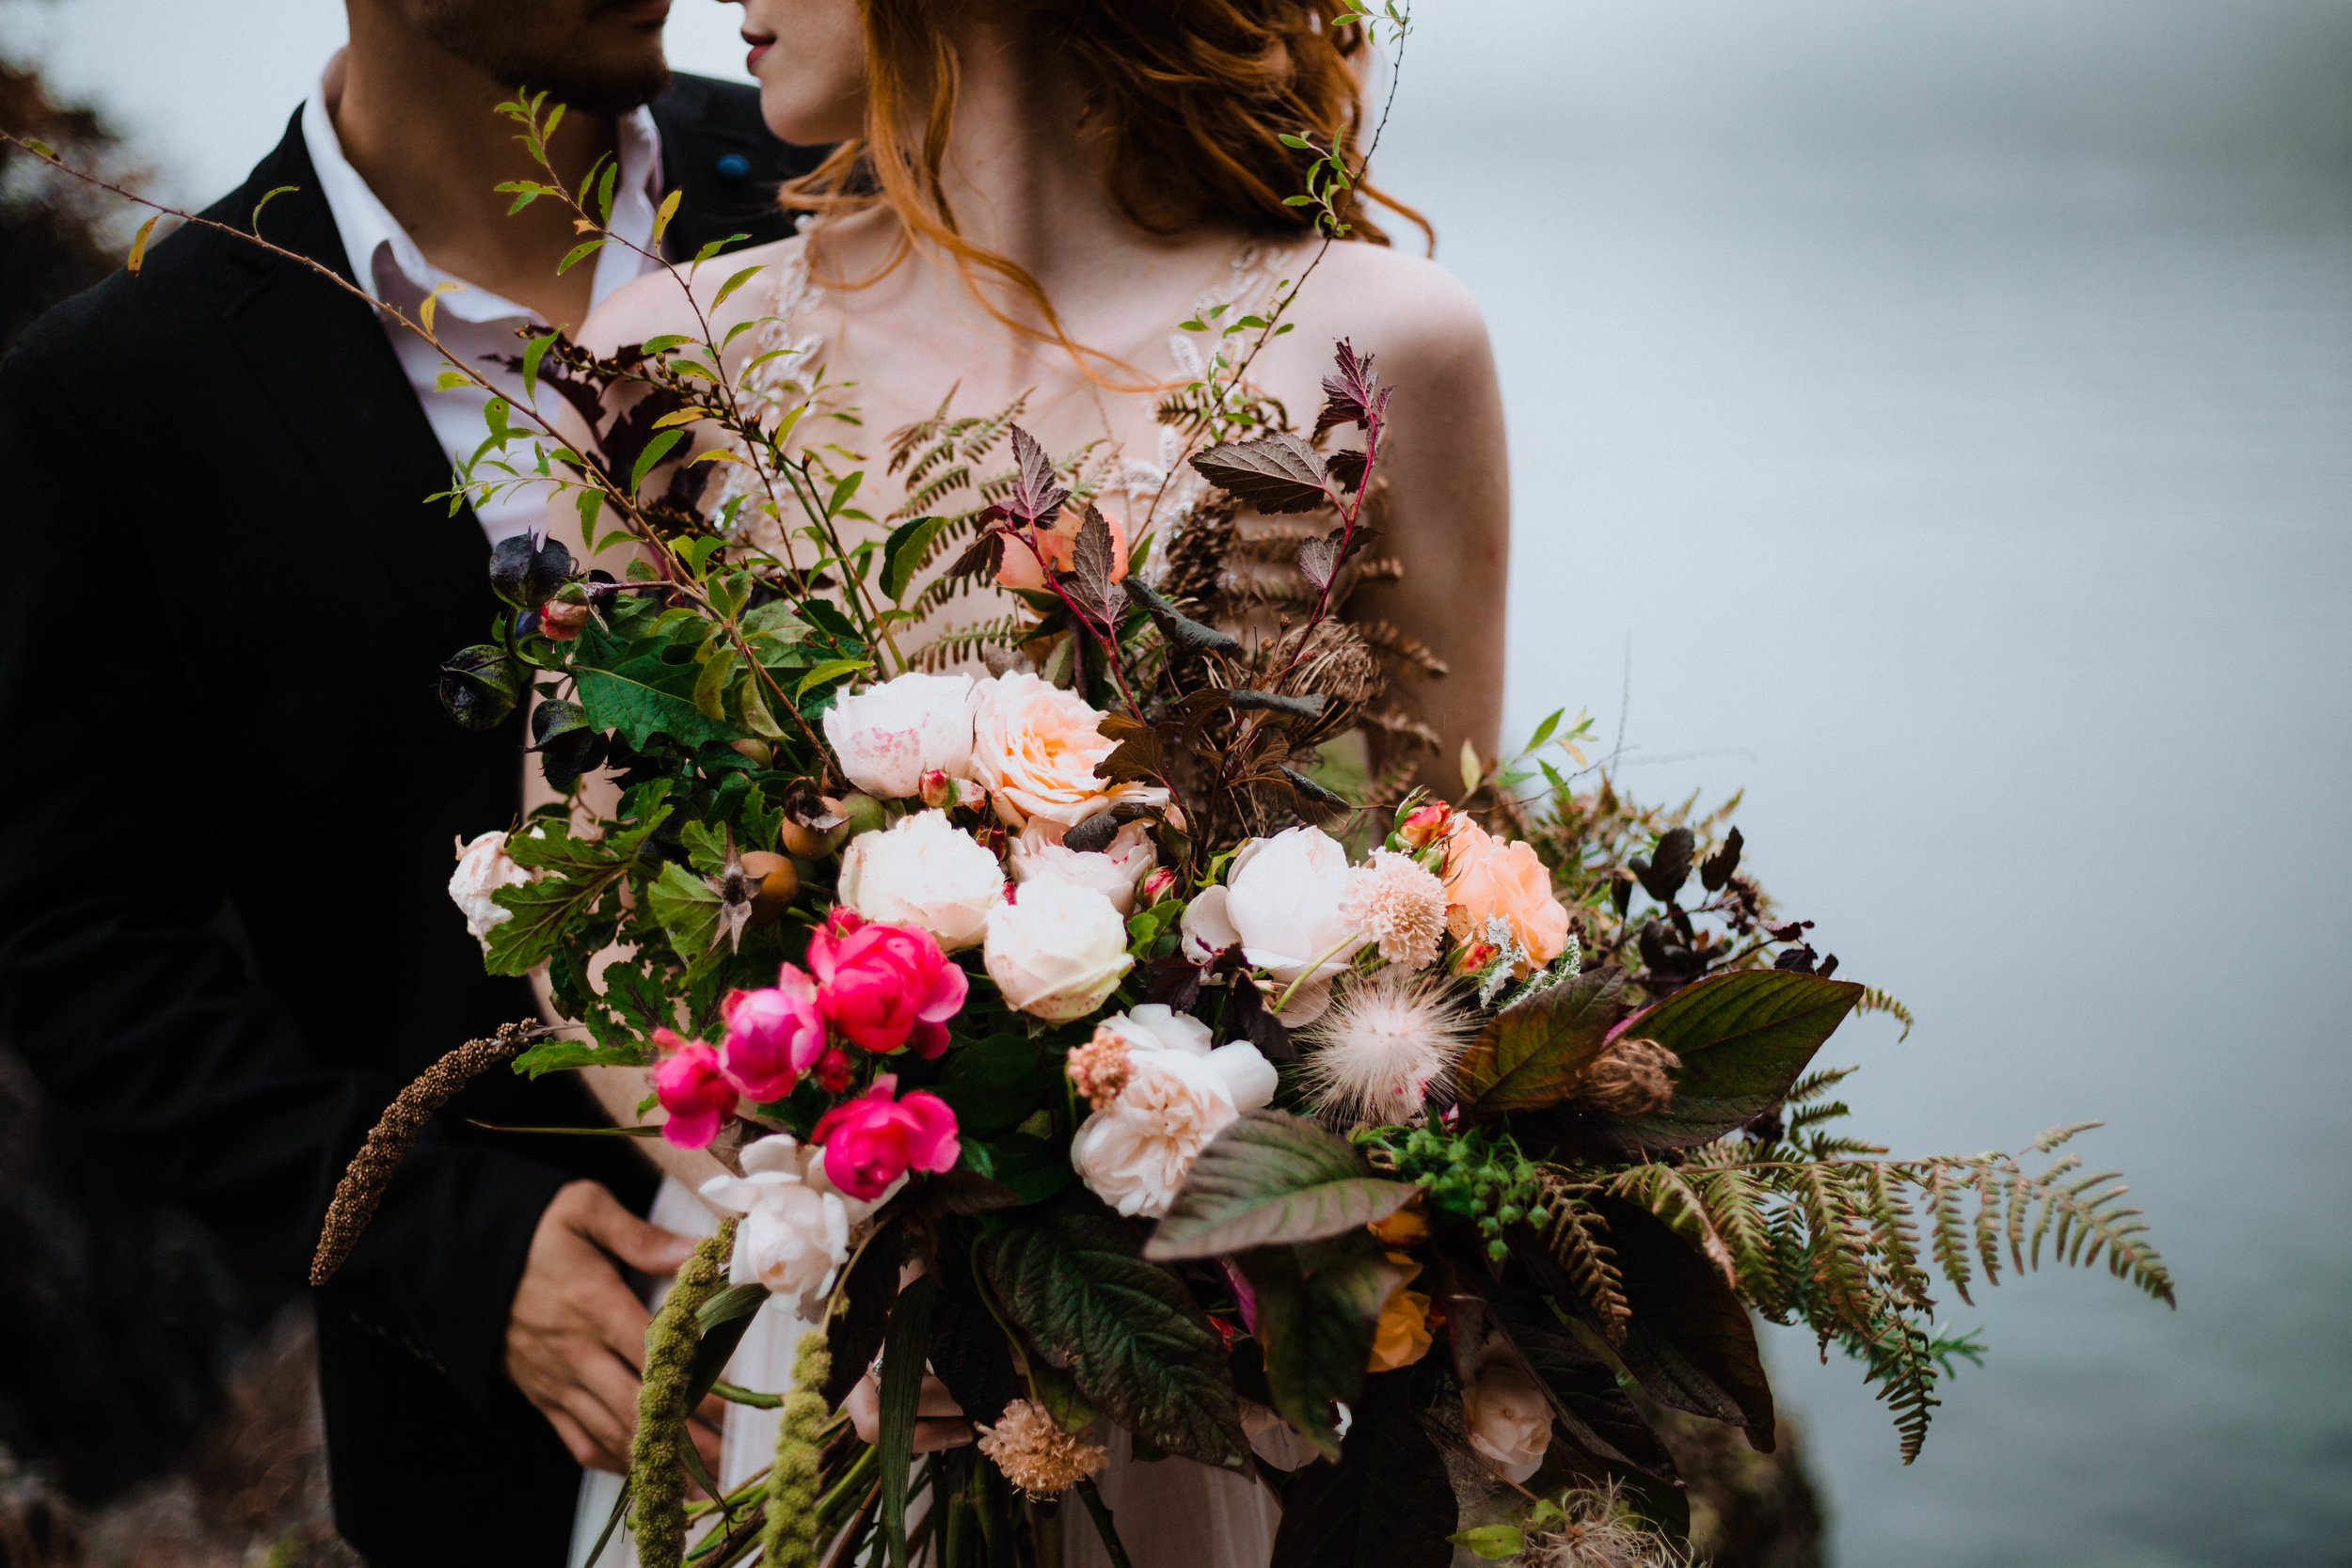 celtic-elopement-flowers-by-cartreff-gardens